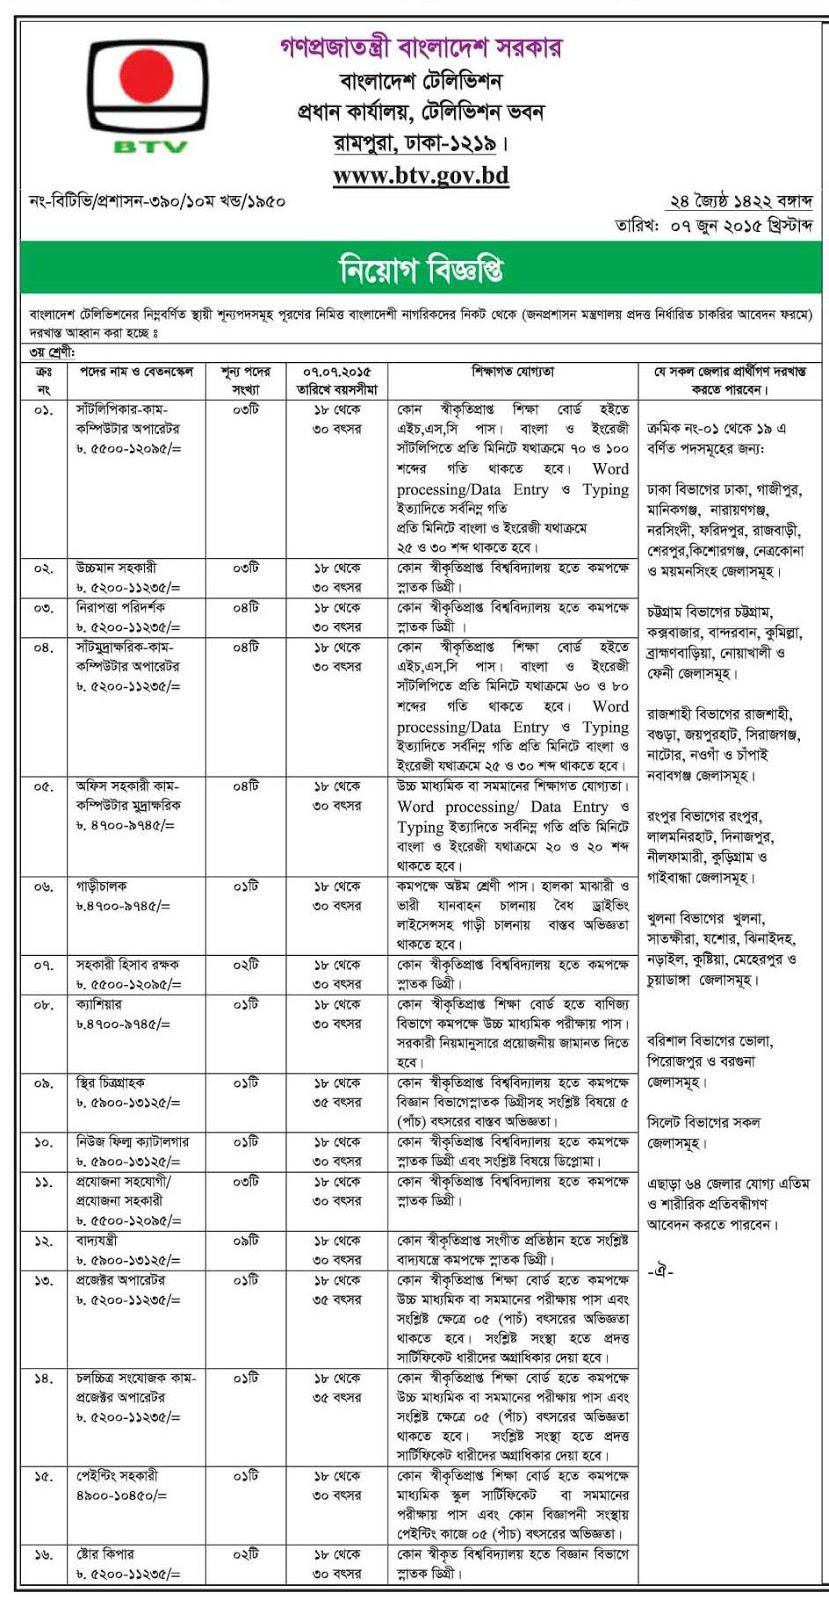 general bcs medical engineering jobs bank jobs bd jobs job in btv television